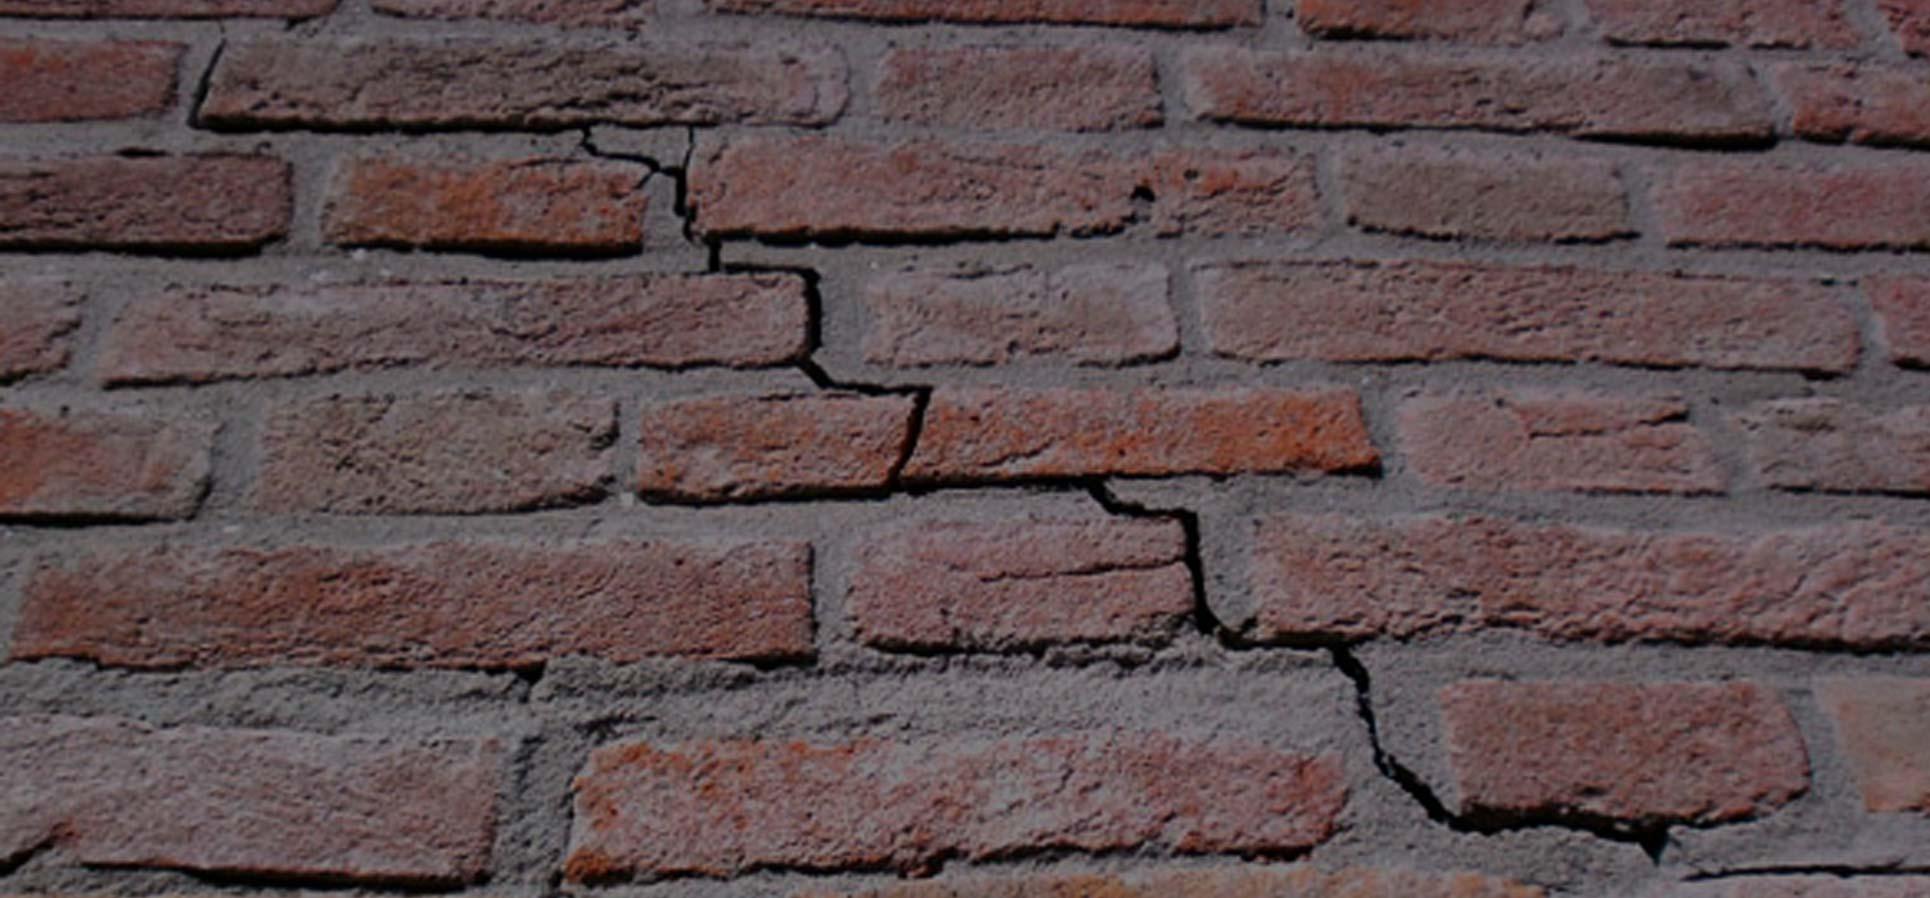 Crepe sui muri difech difech for Resina per crepe nei muri